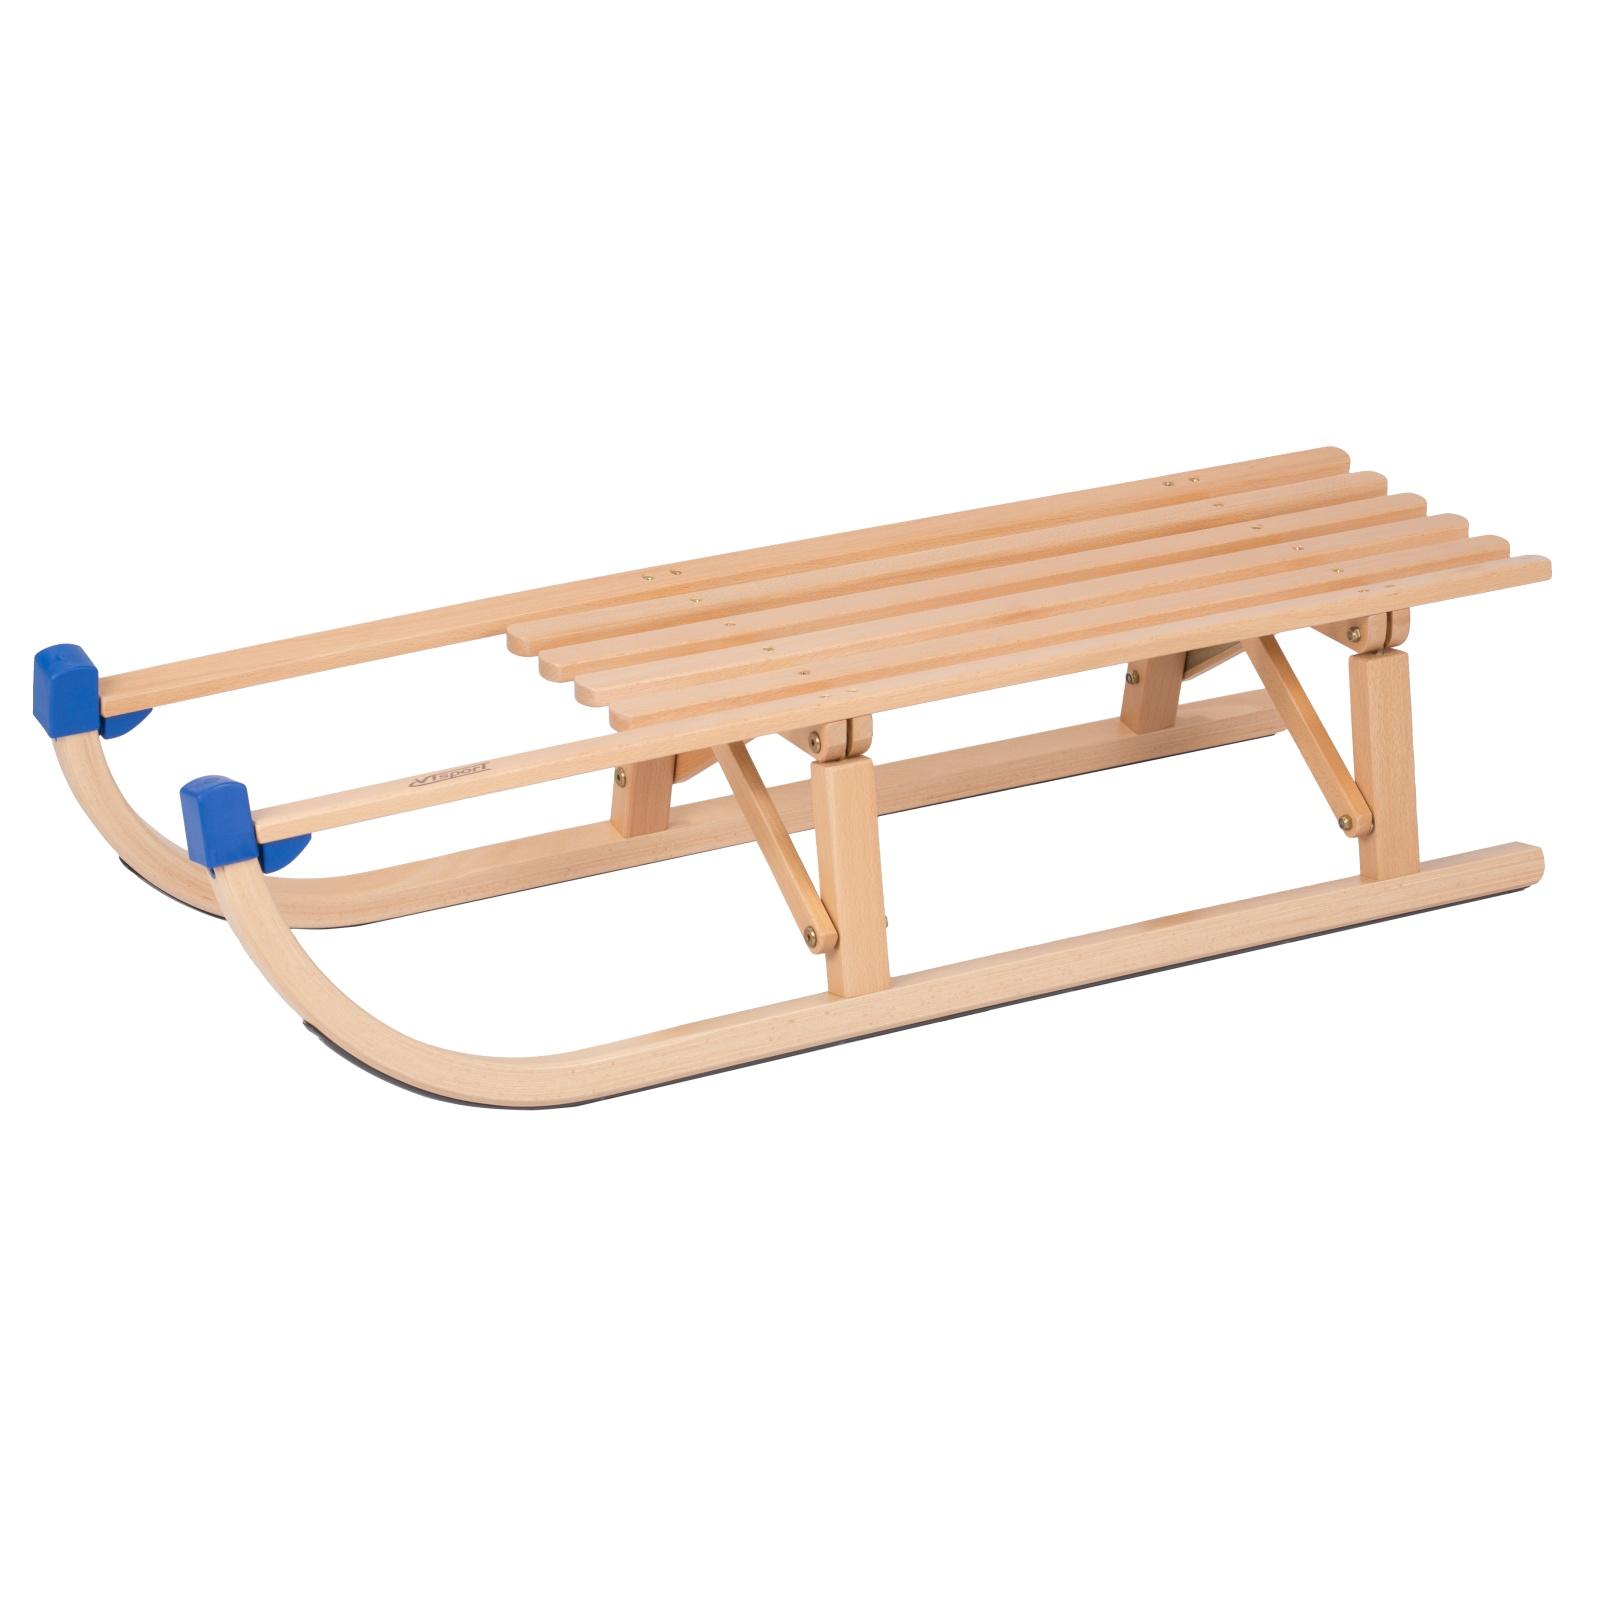 Sane drevené VT-SPORT Davos diaľka 100 cm - skladacie